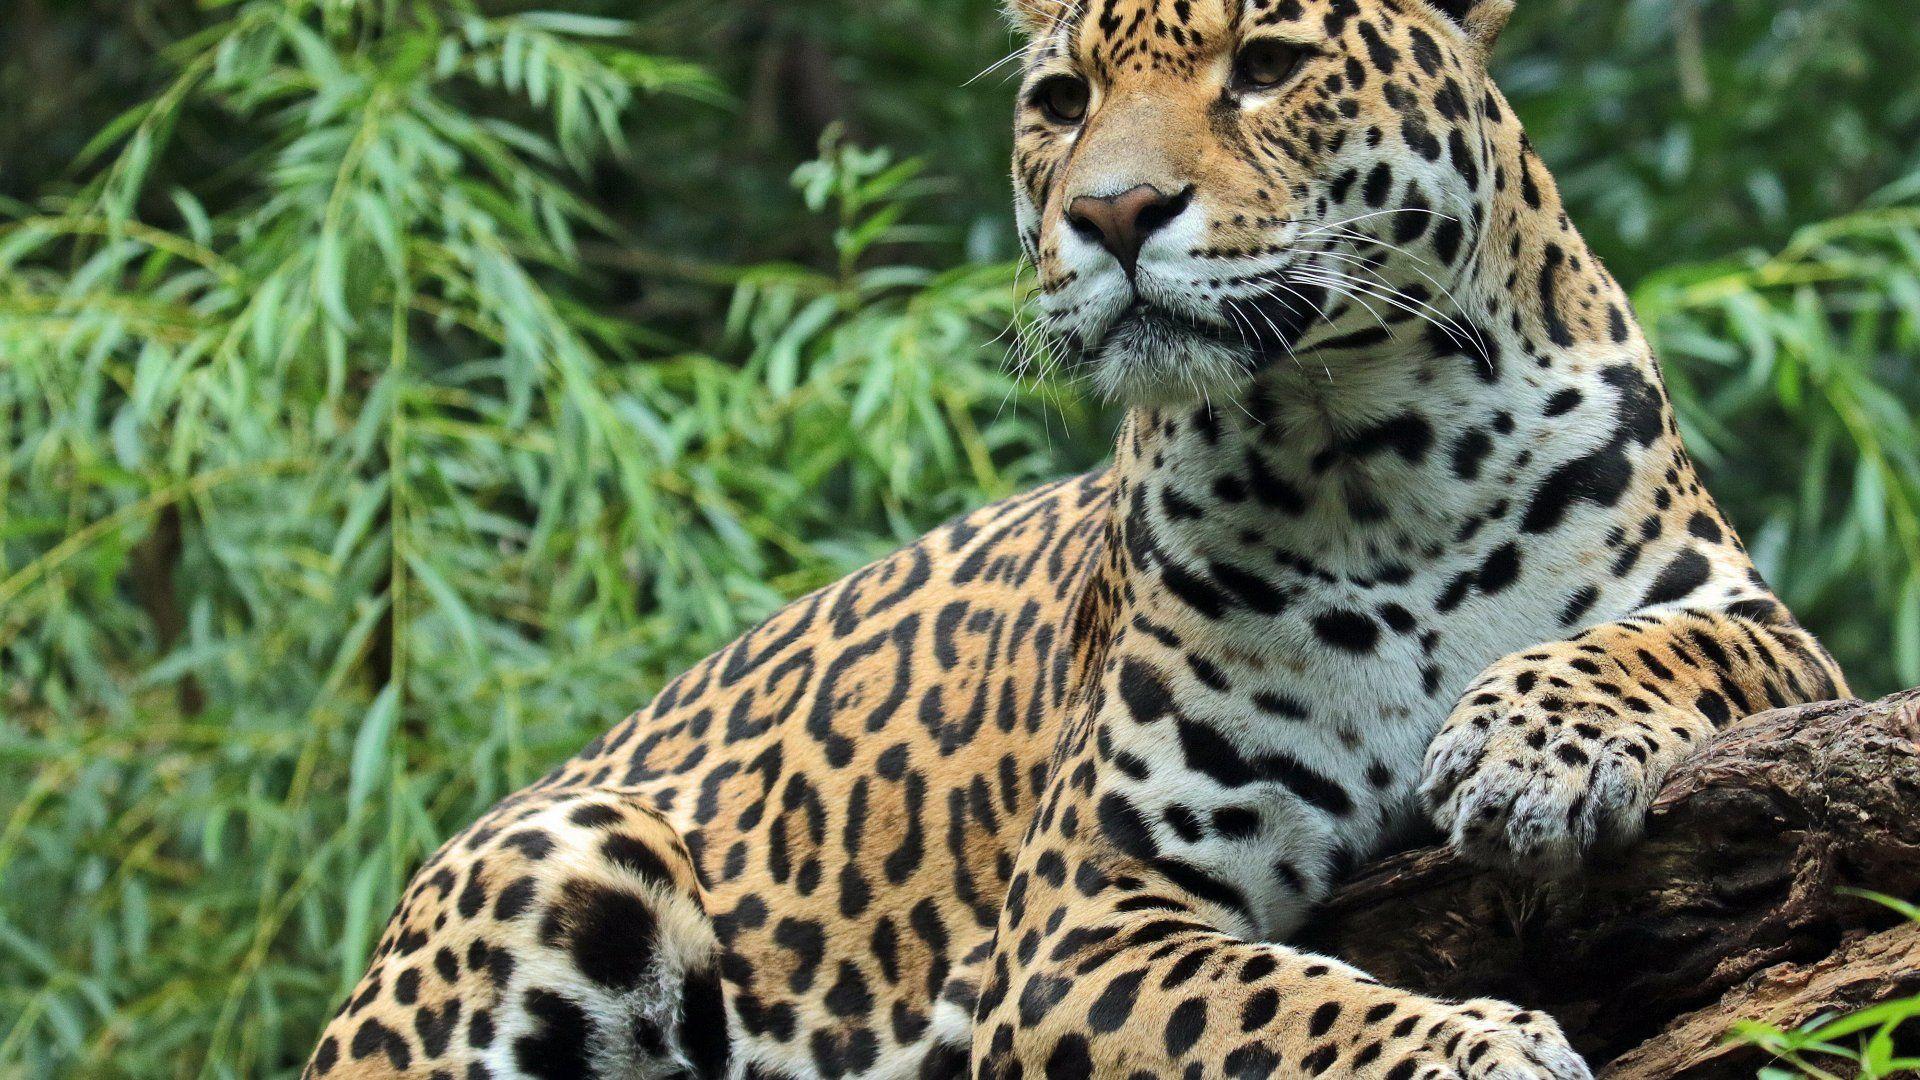 Jaguar Animal Pictures 1280 1024